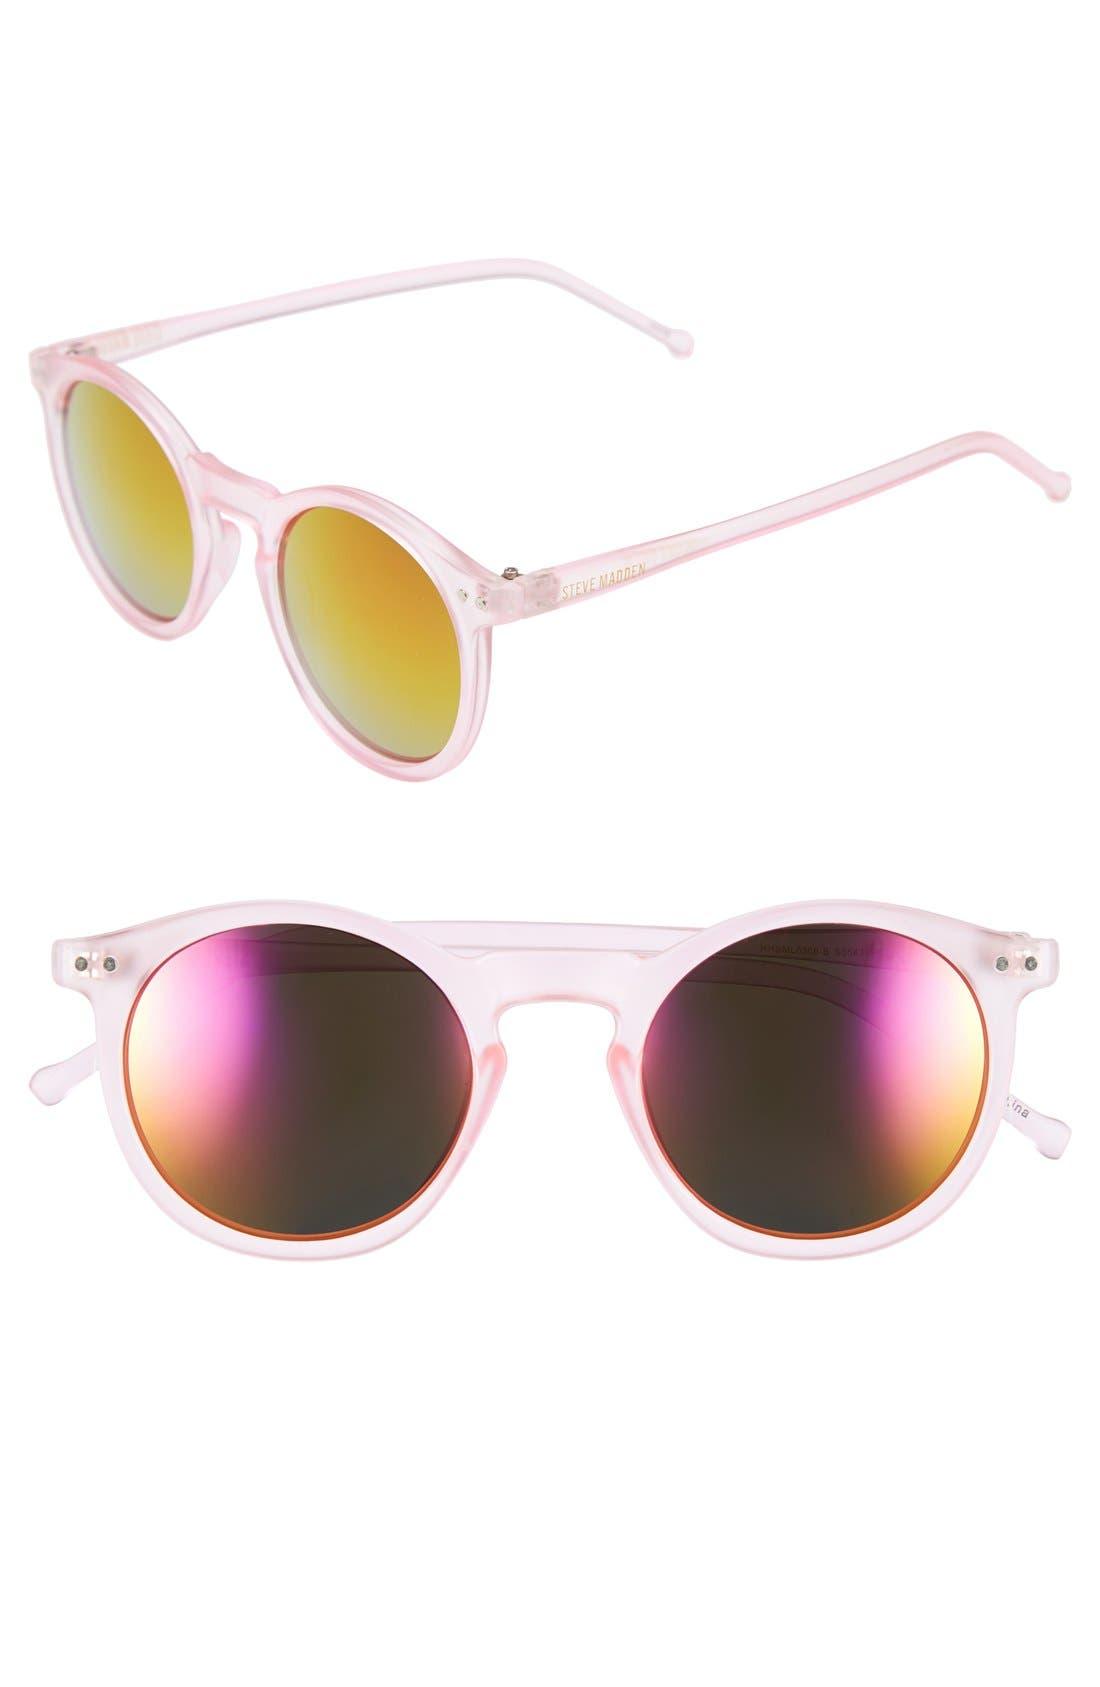 Main Image - Steve Madden 49mm Round Sunglasses